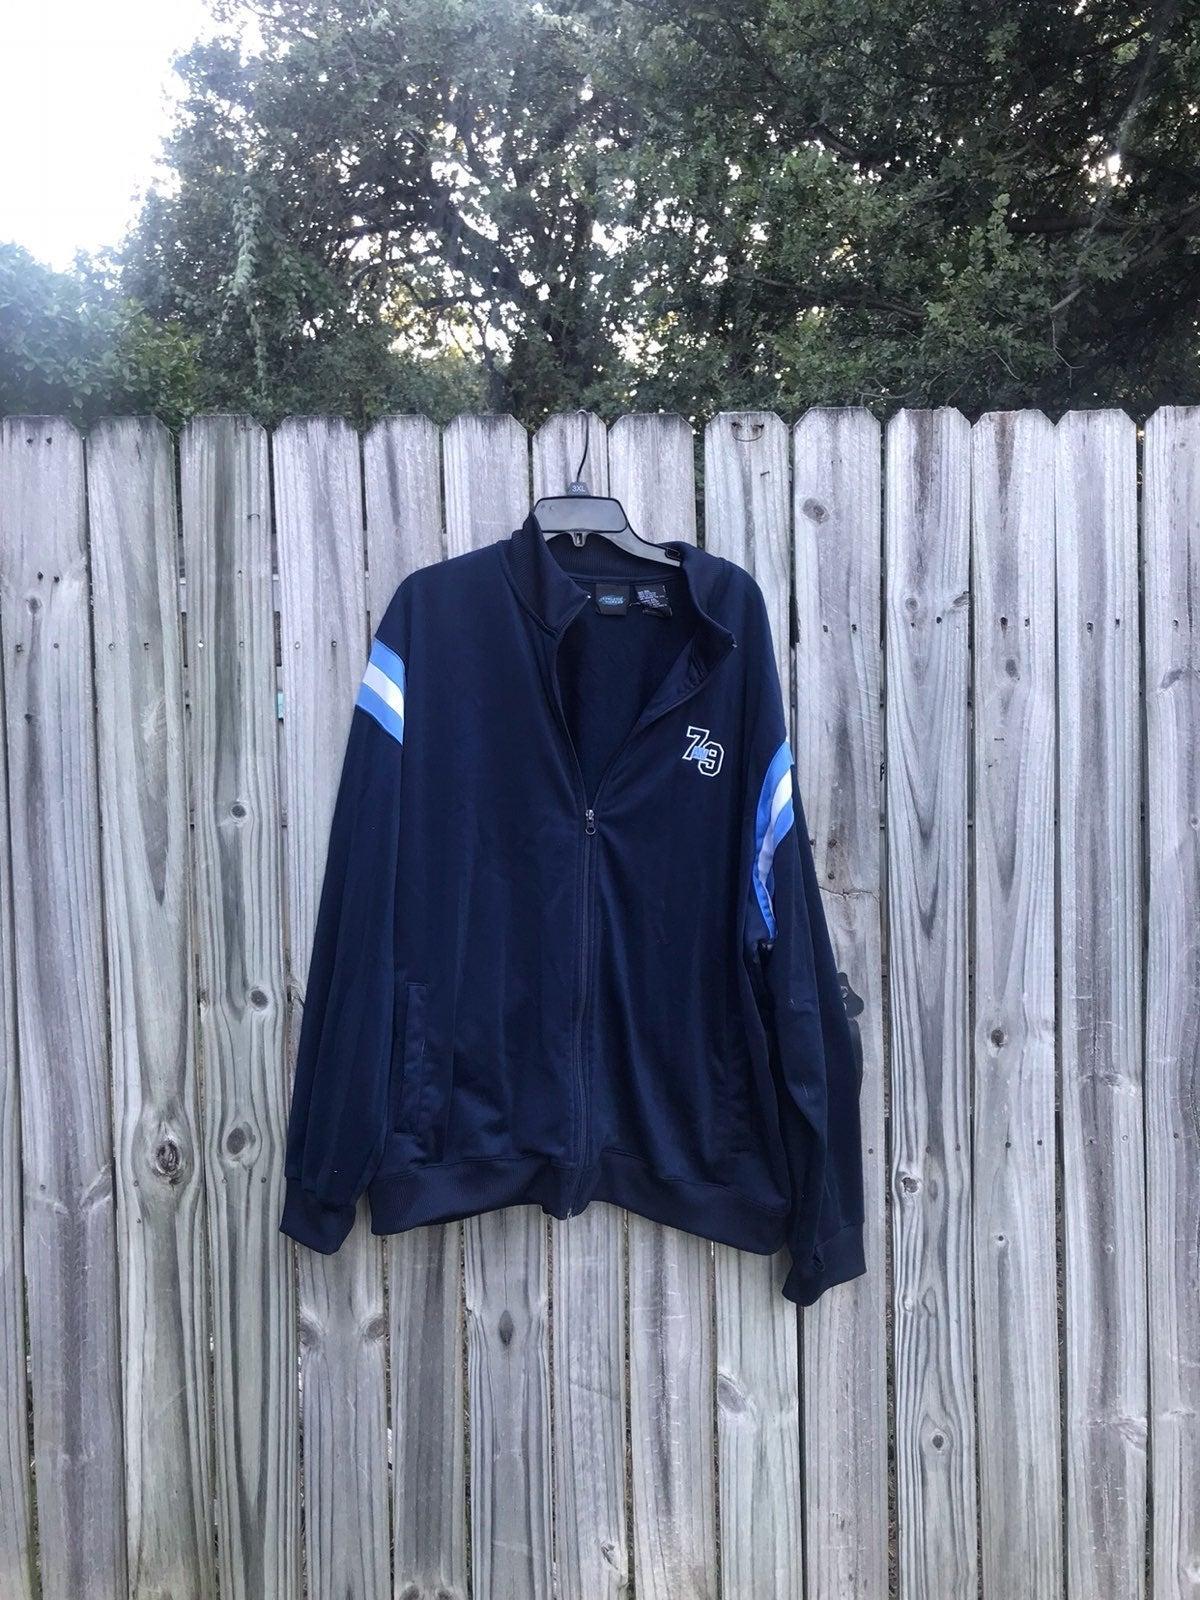 2XL Athletic Works Track Jacket